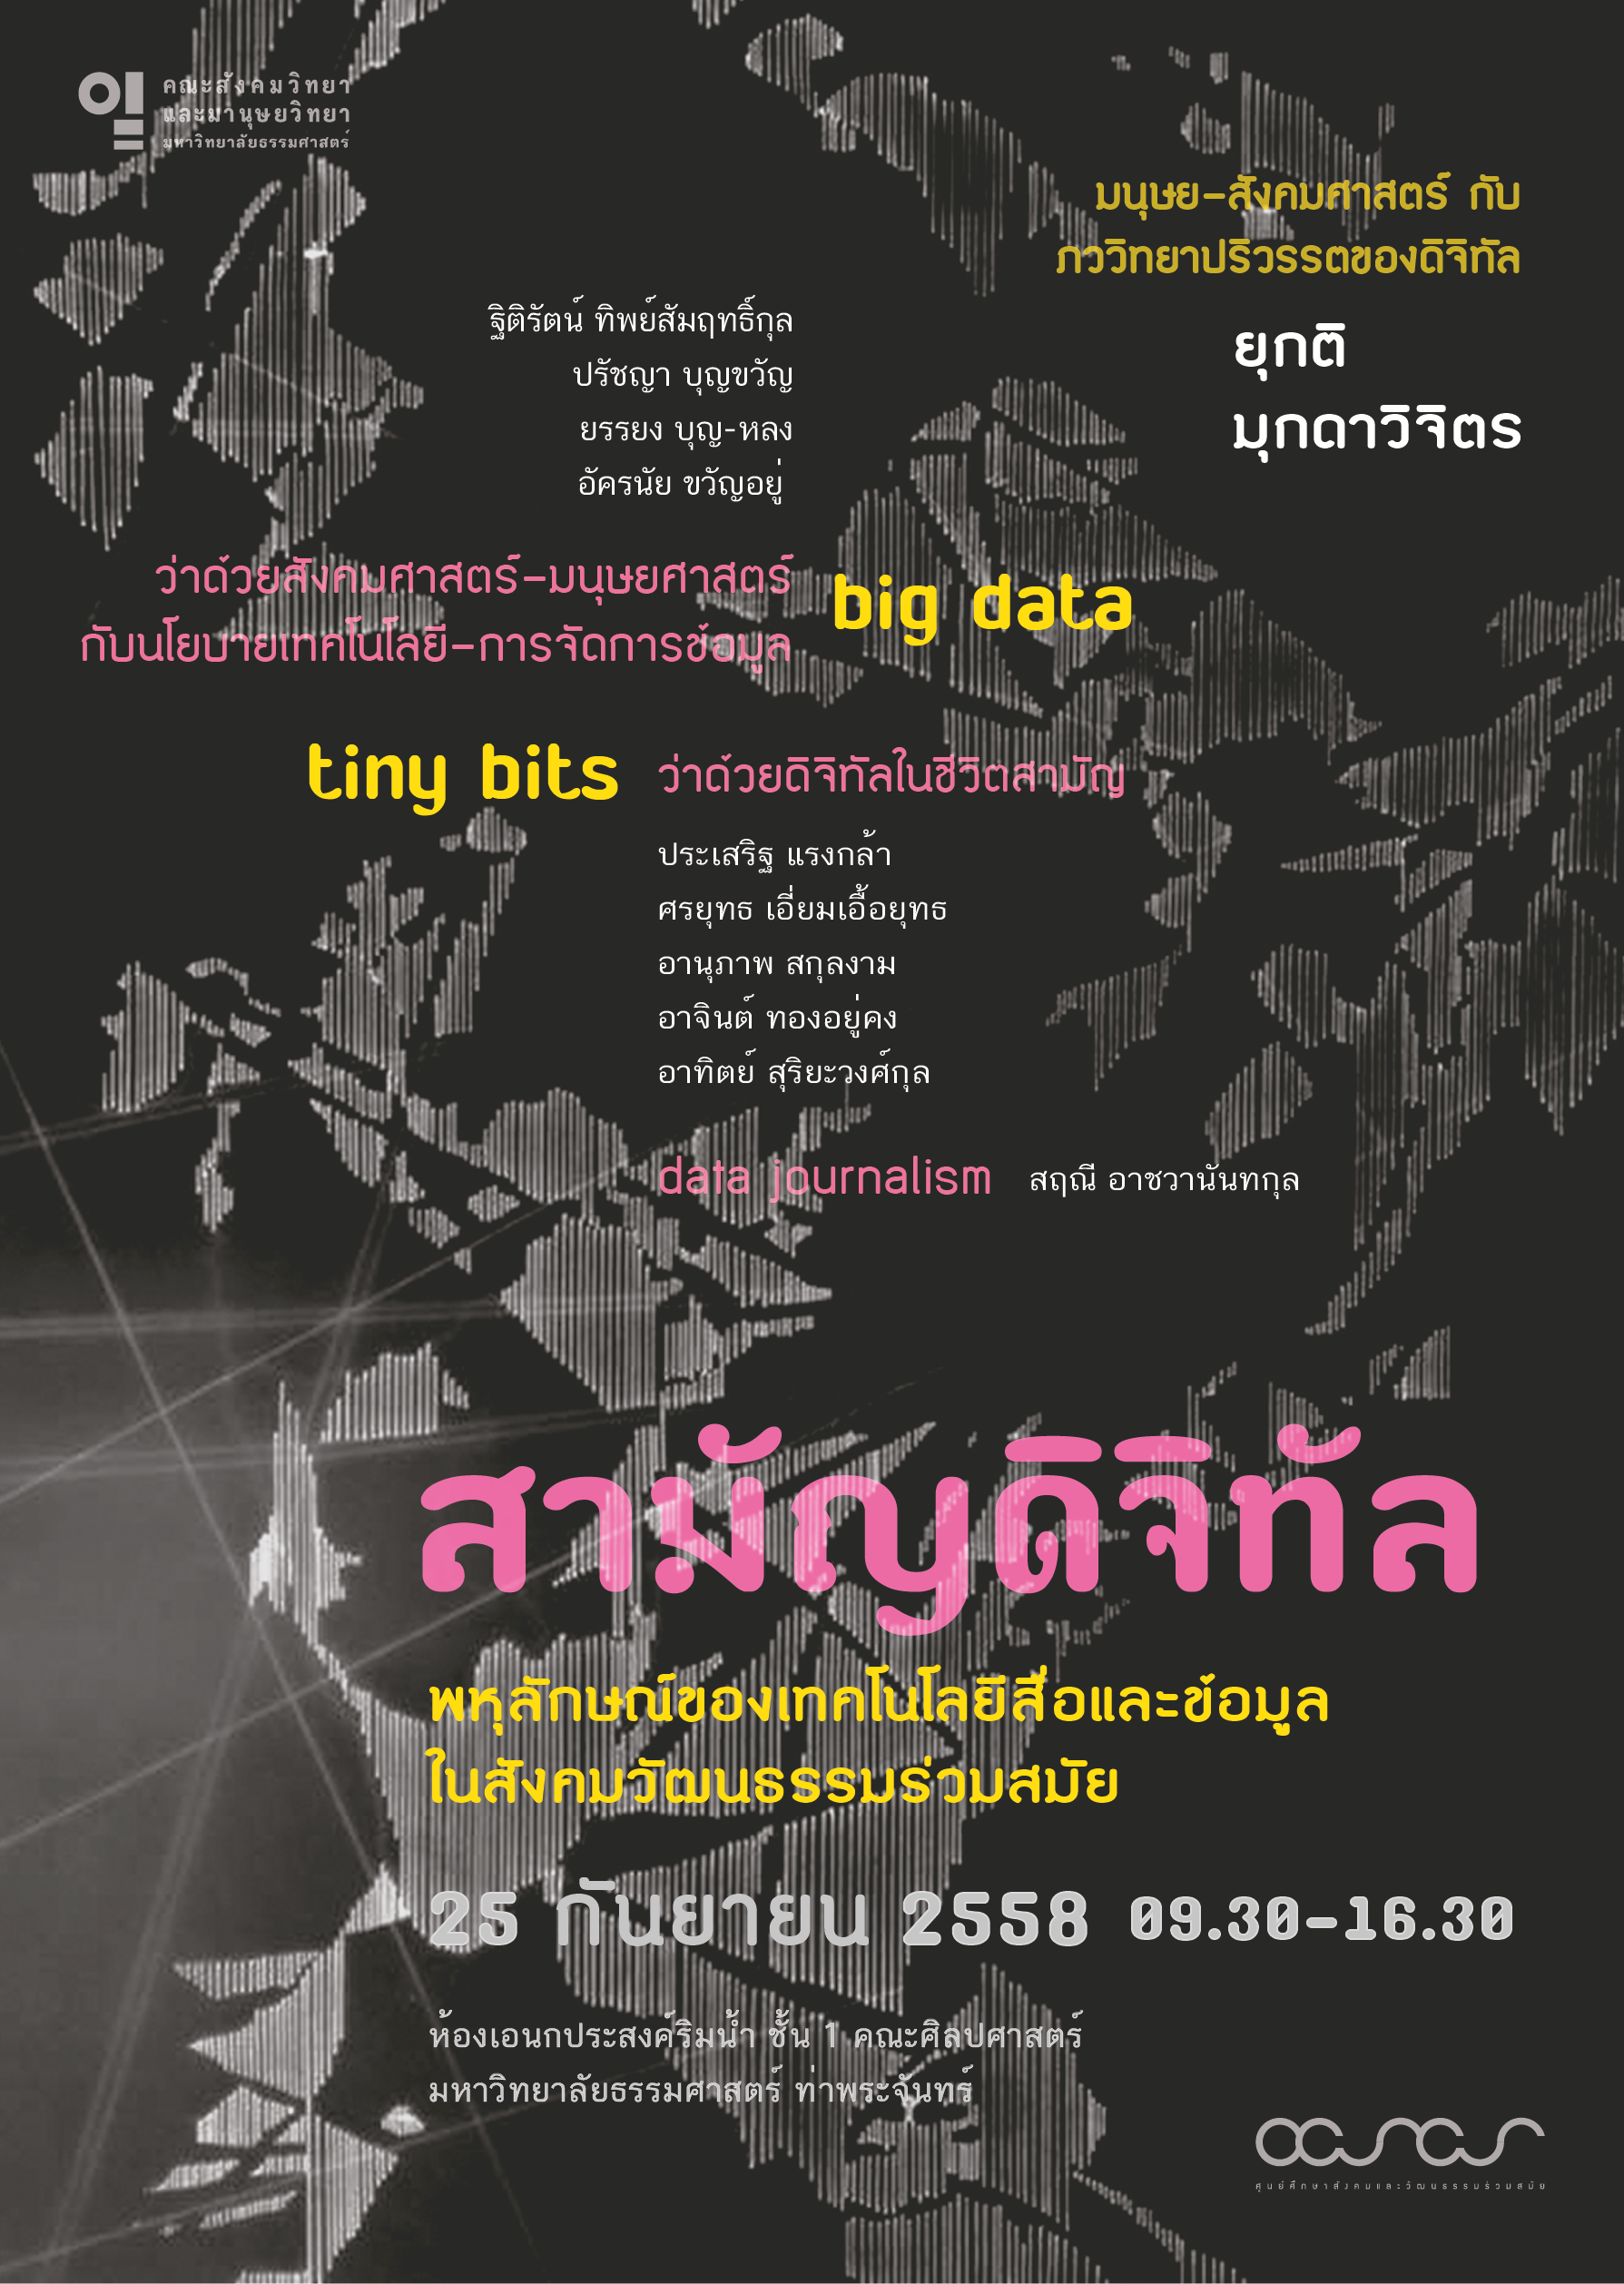 ccscs-seminar-2015-mundane digital